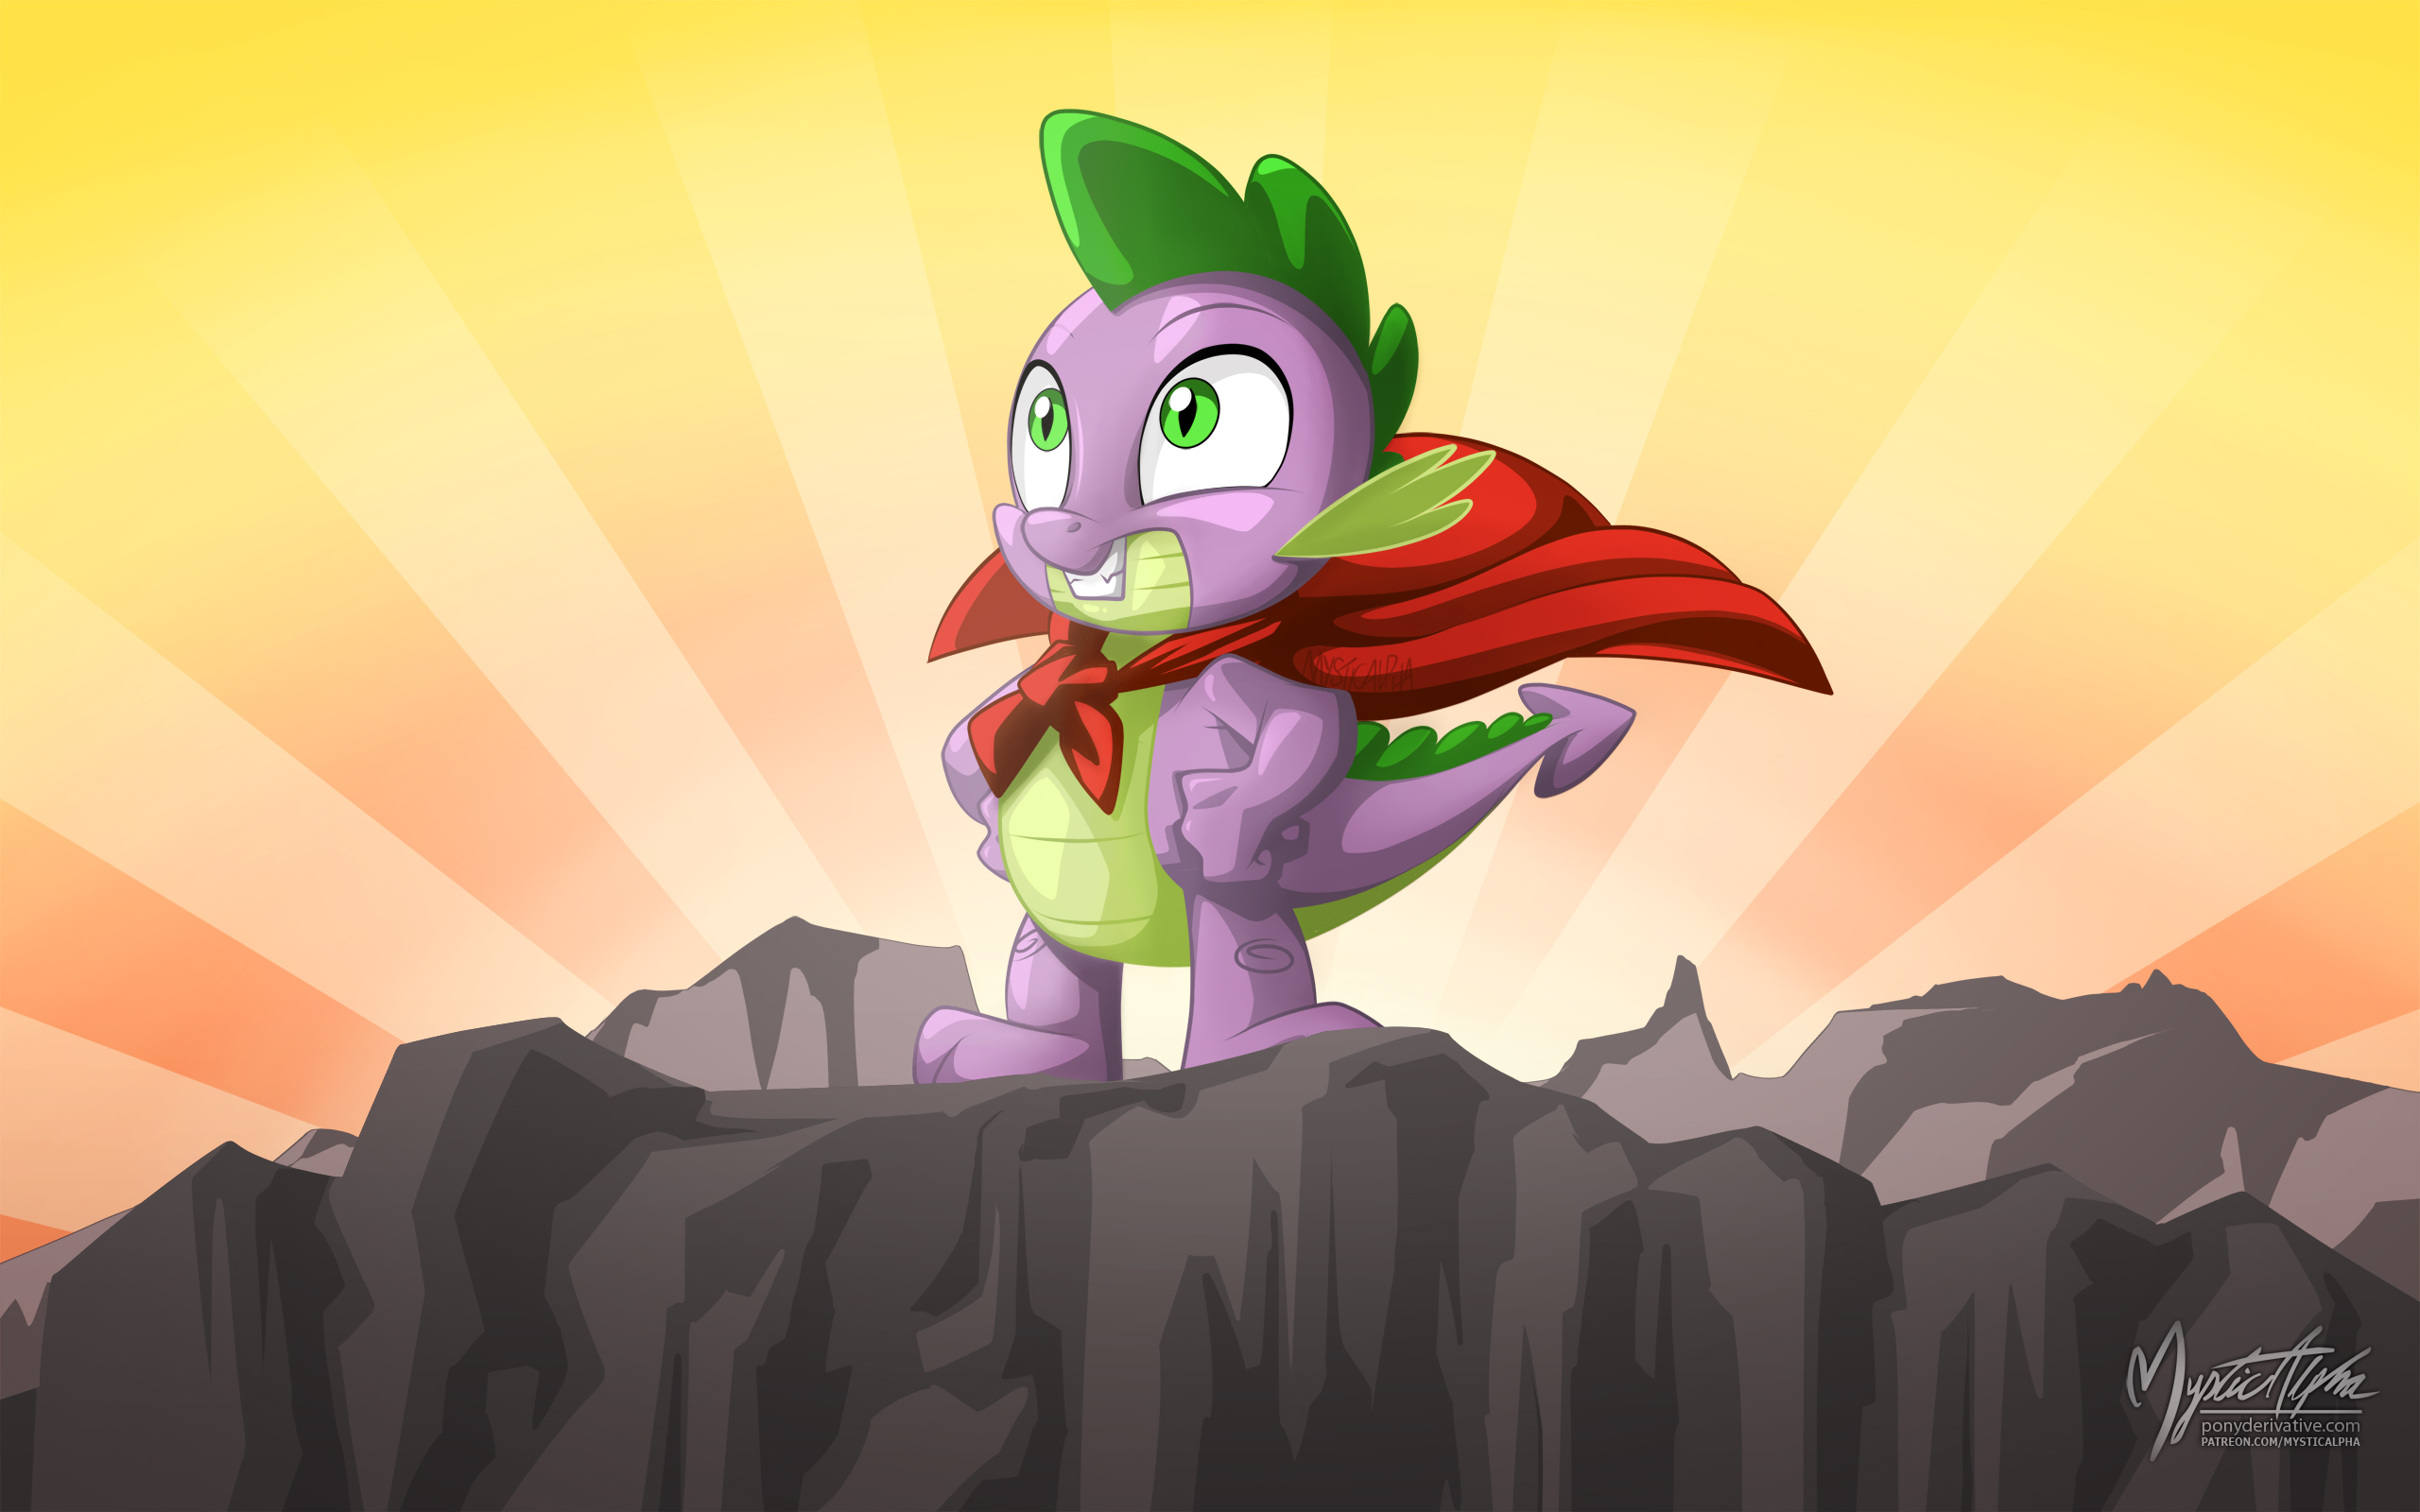 Spike the Hero